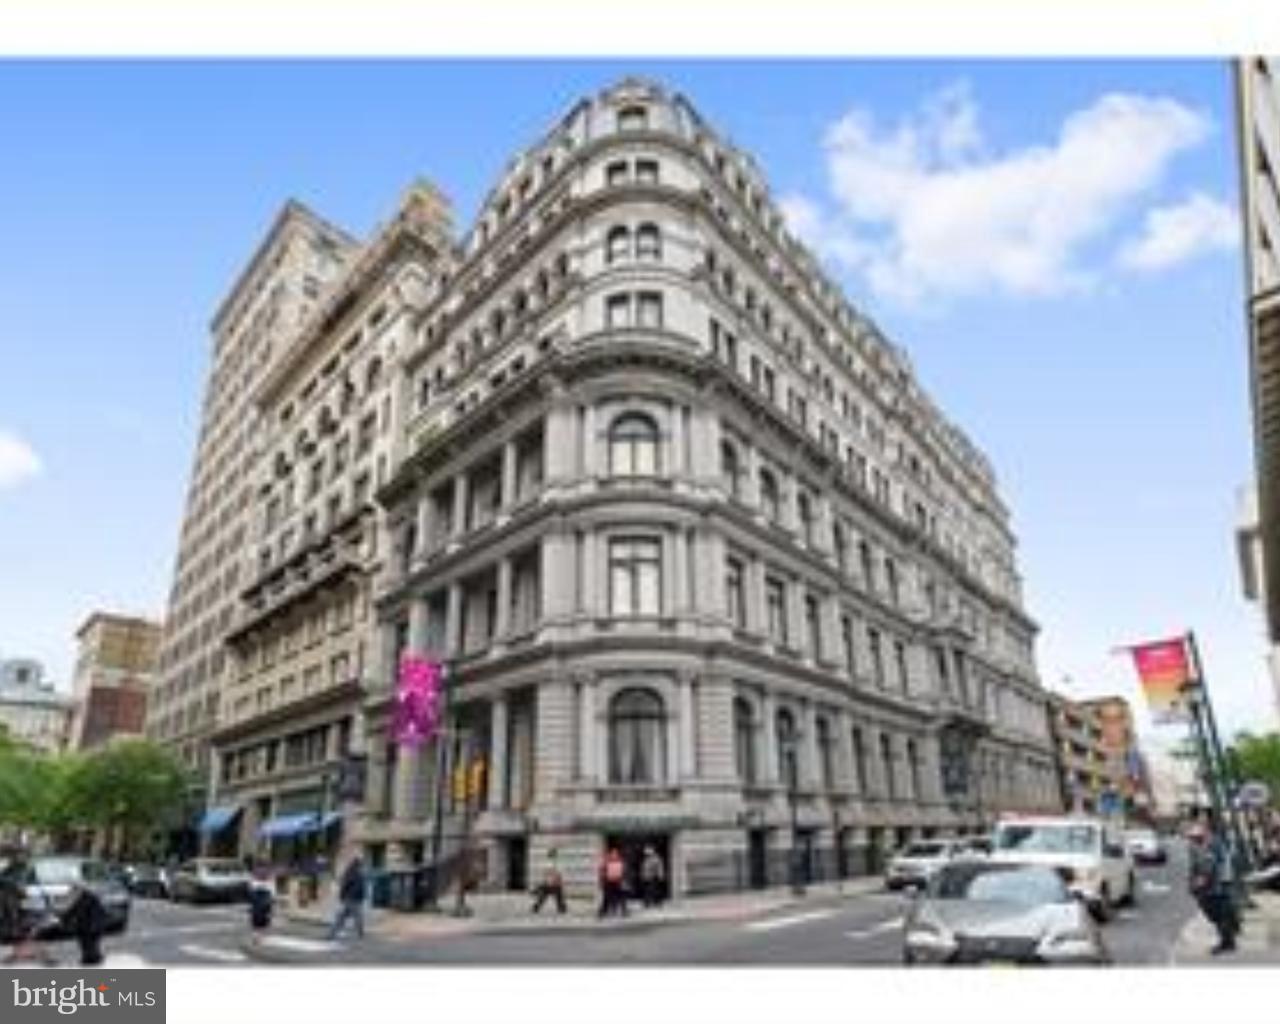 1001-13 Chestnut St #803w, Philadelphia, PA 19107, MLS #PAPH507574 - Howard  Hanna